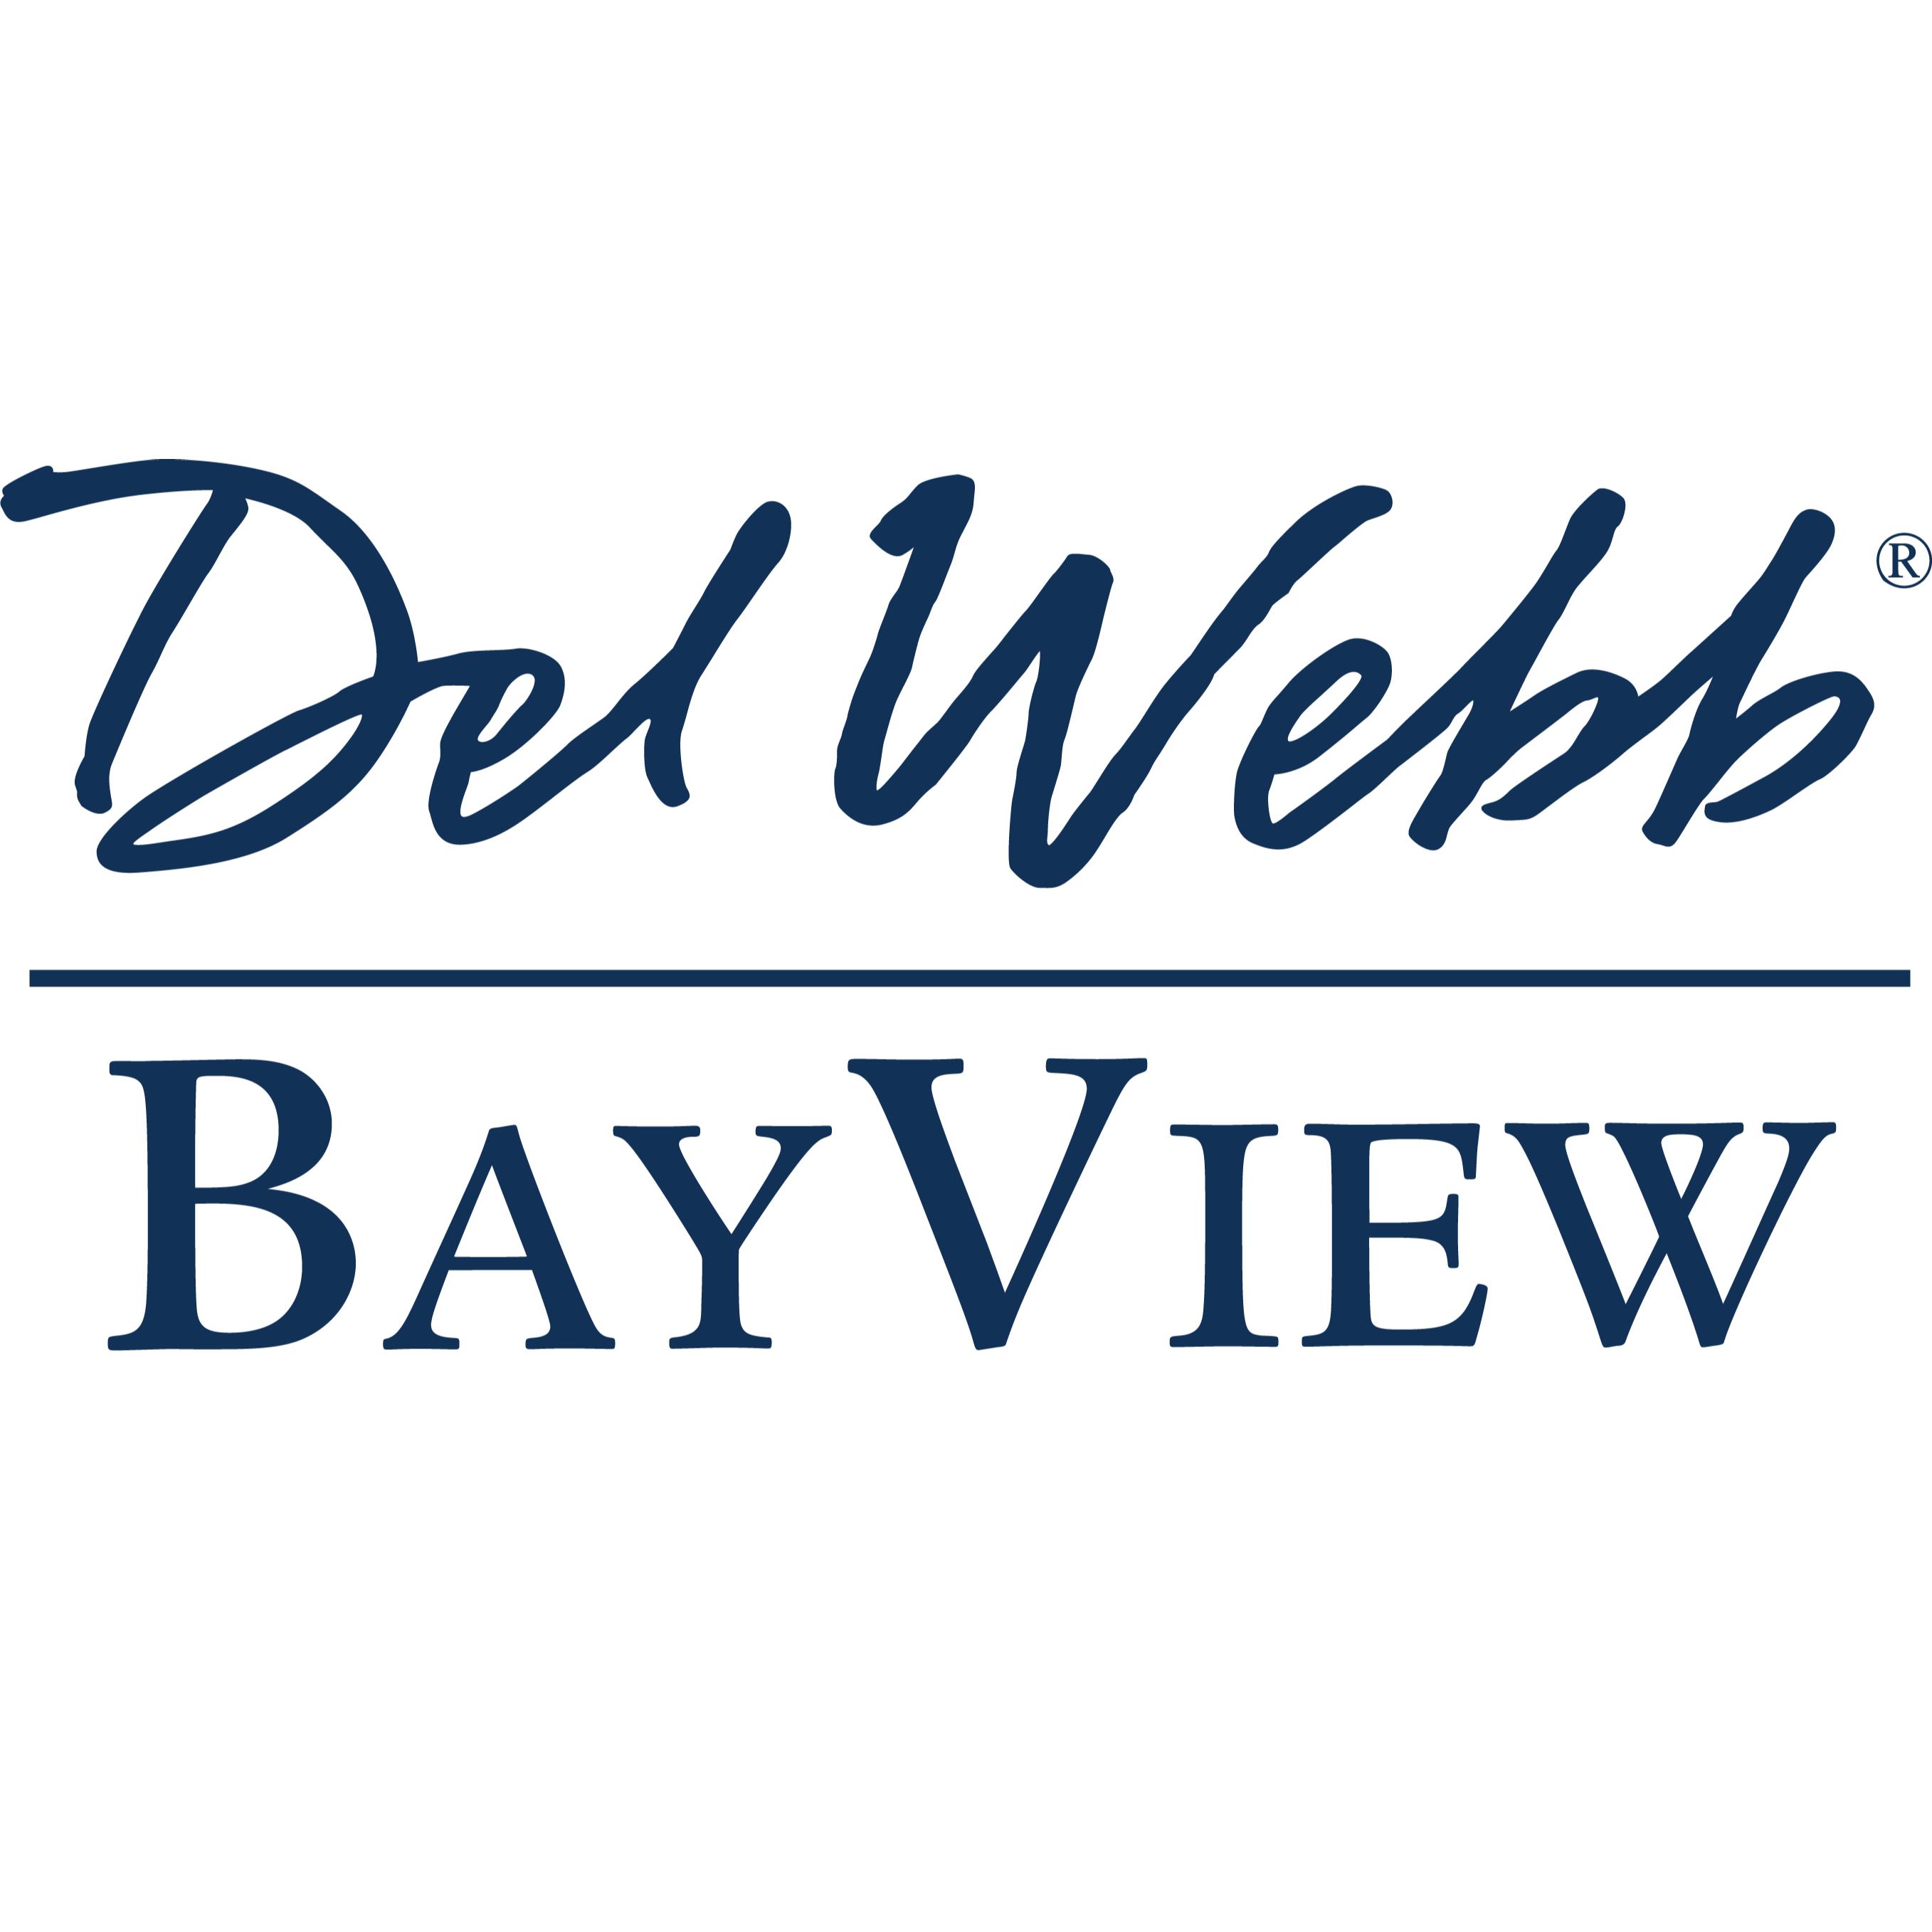 Del Webb BayView